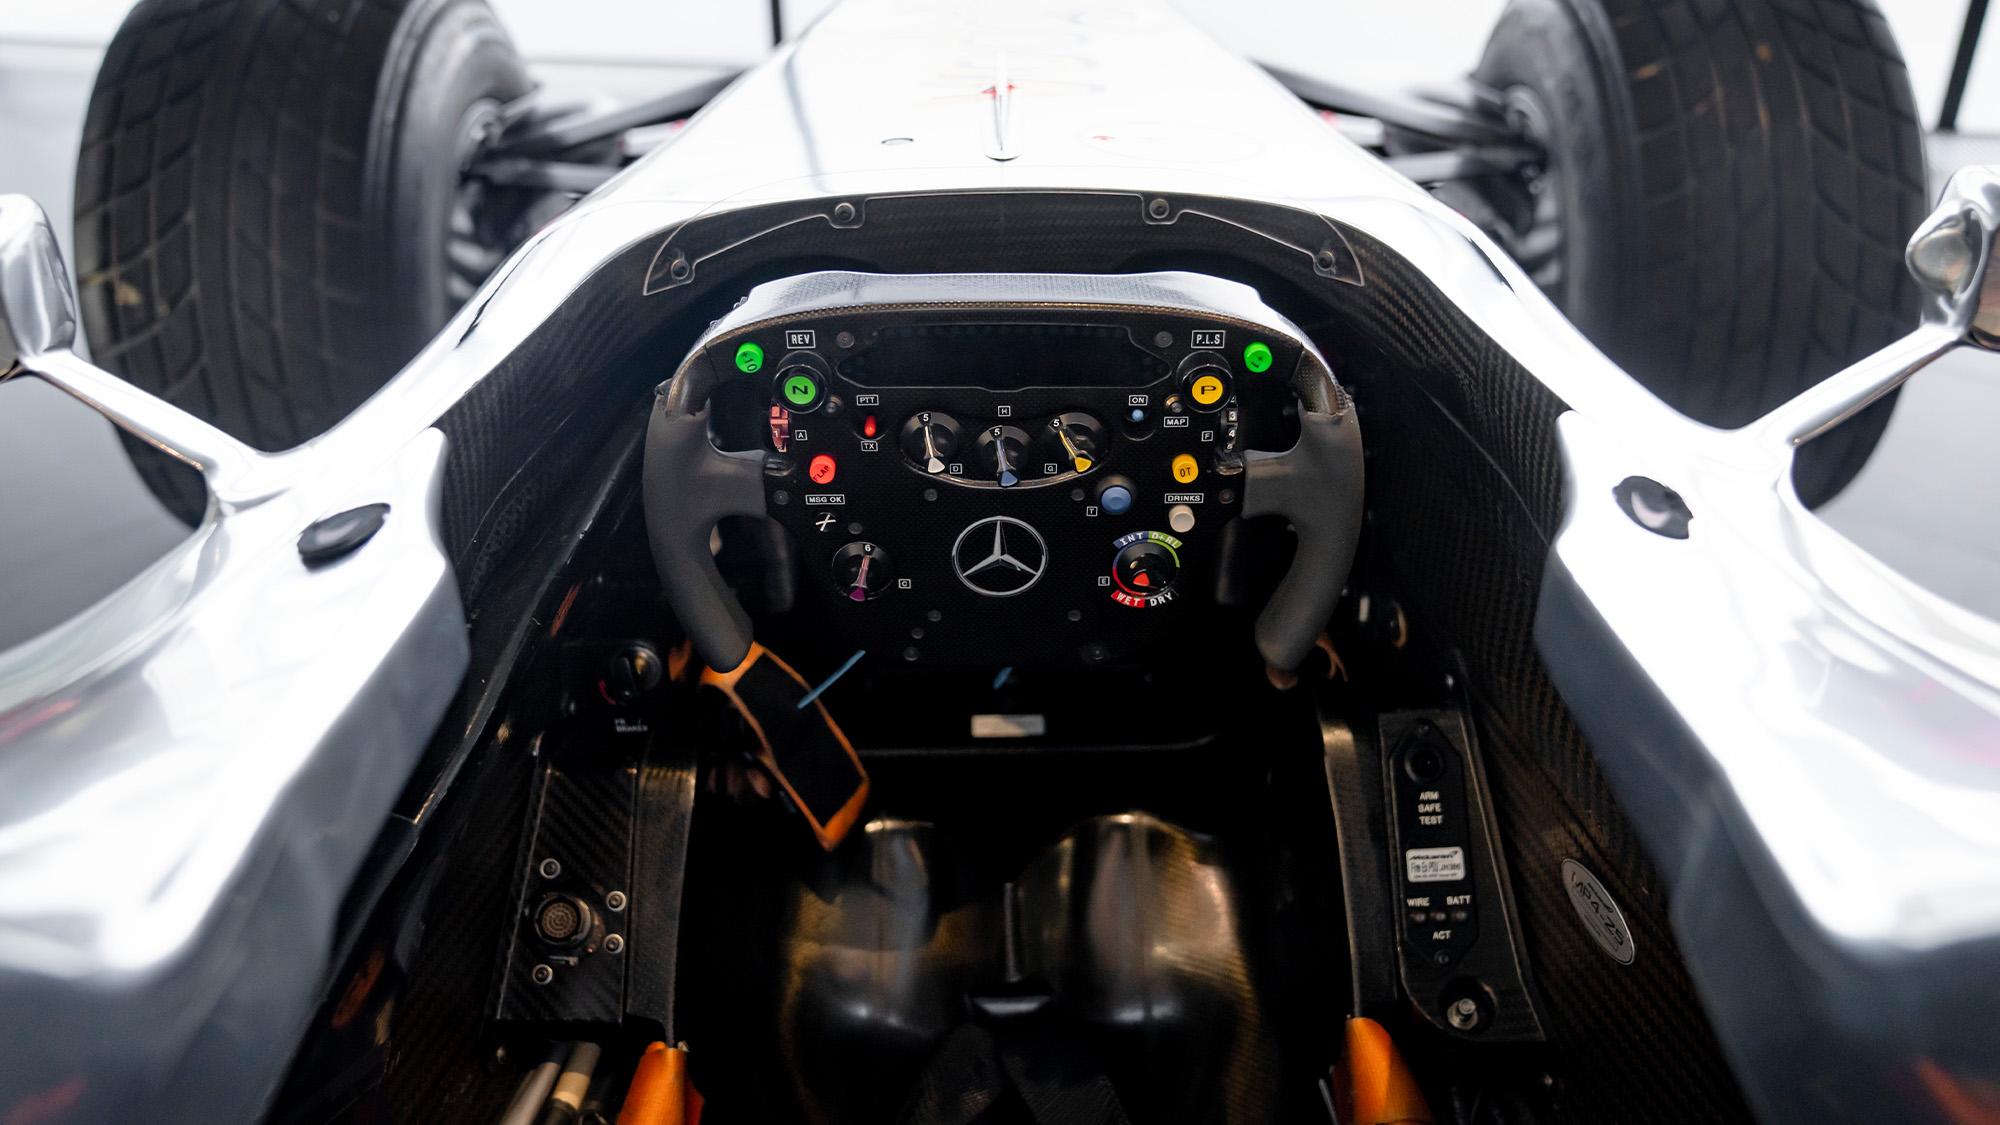 Lewis Hamilton McLaren MP4-25 for auction steering wheel